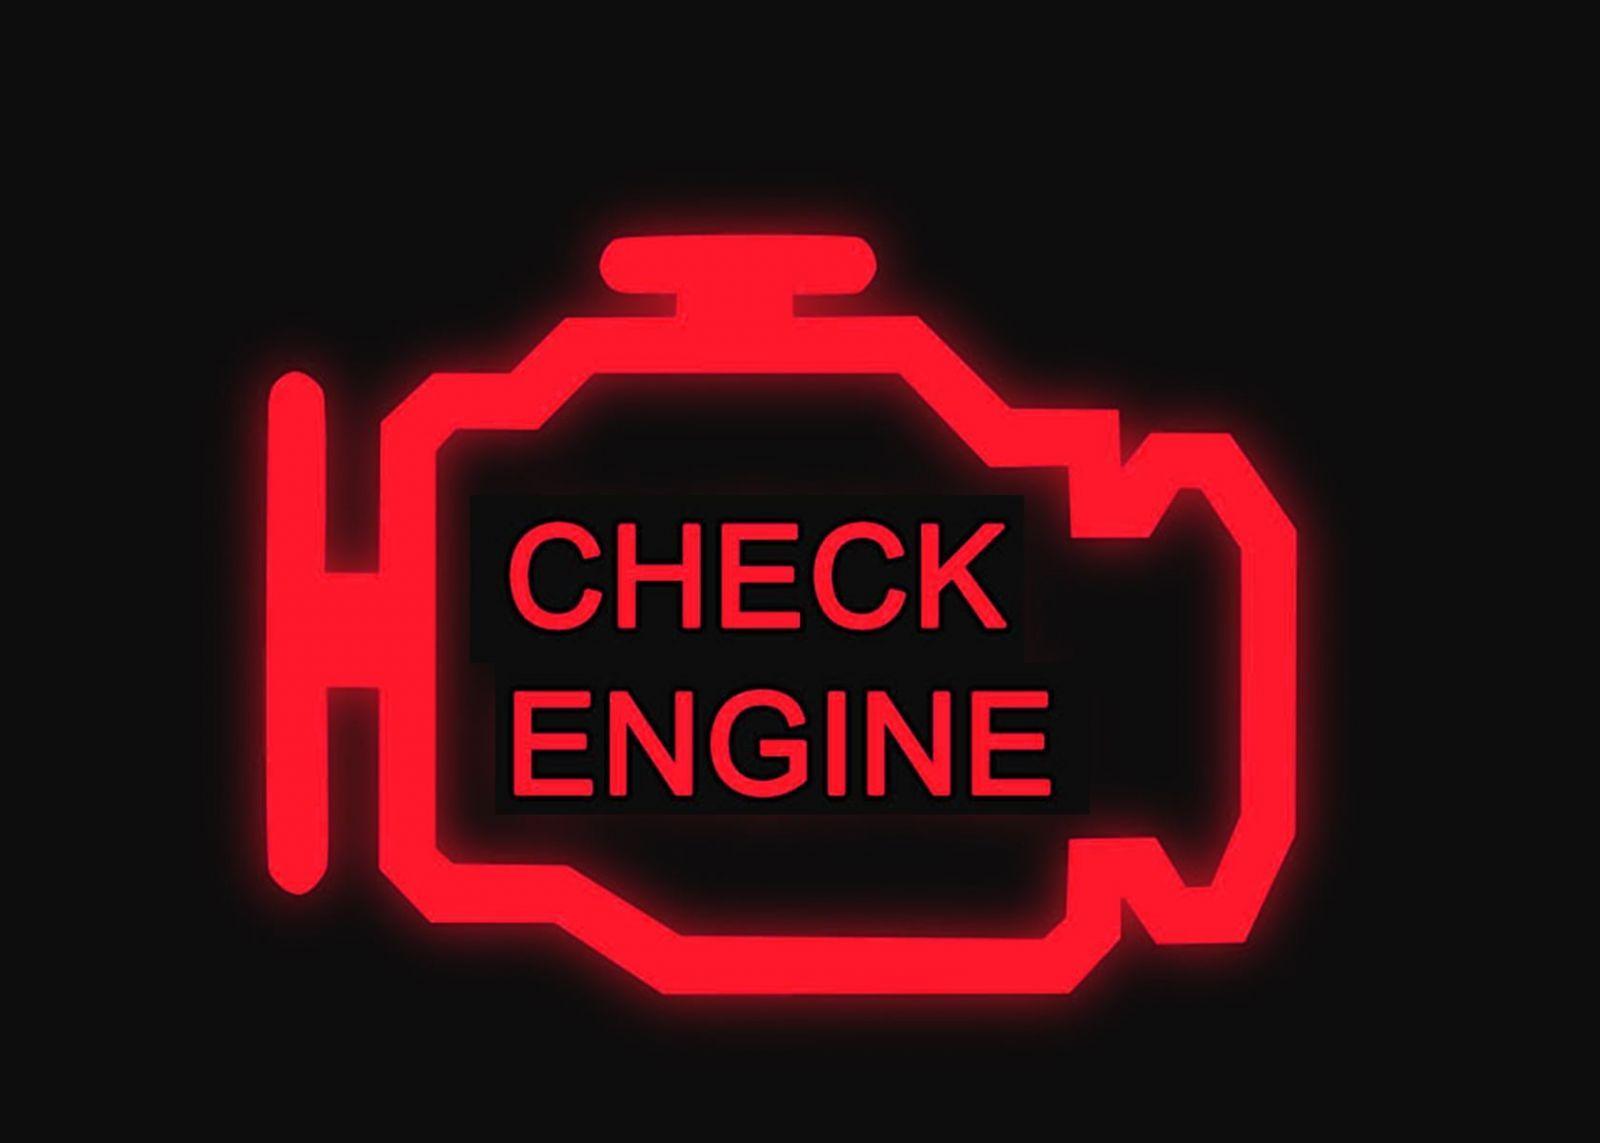 Индикатор Check Engine